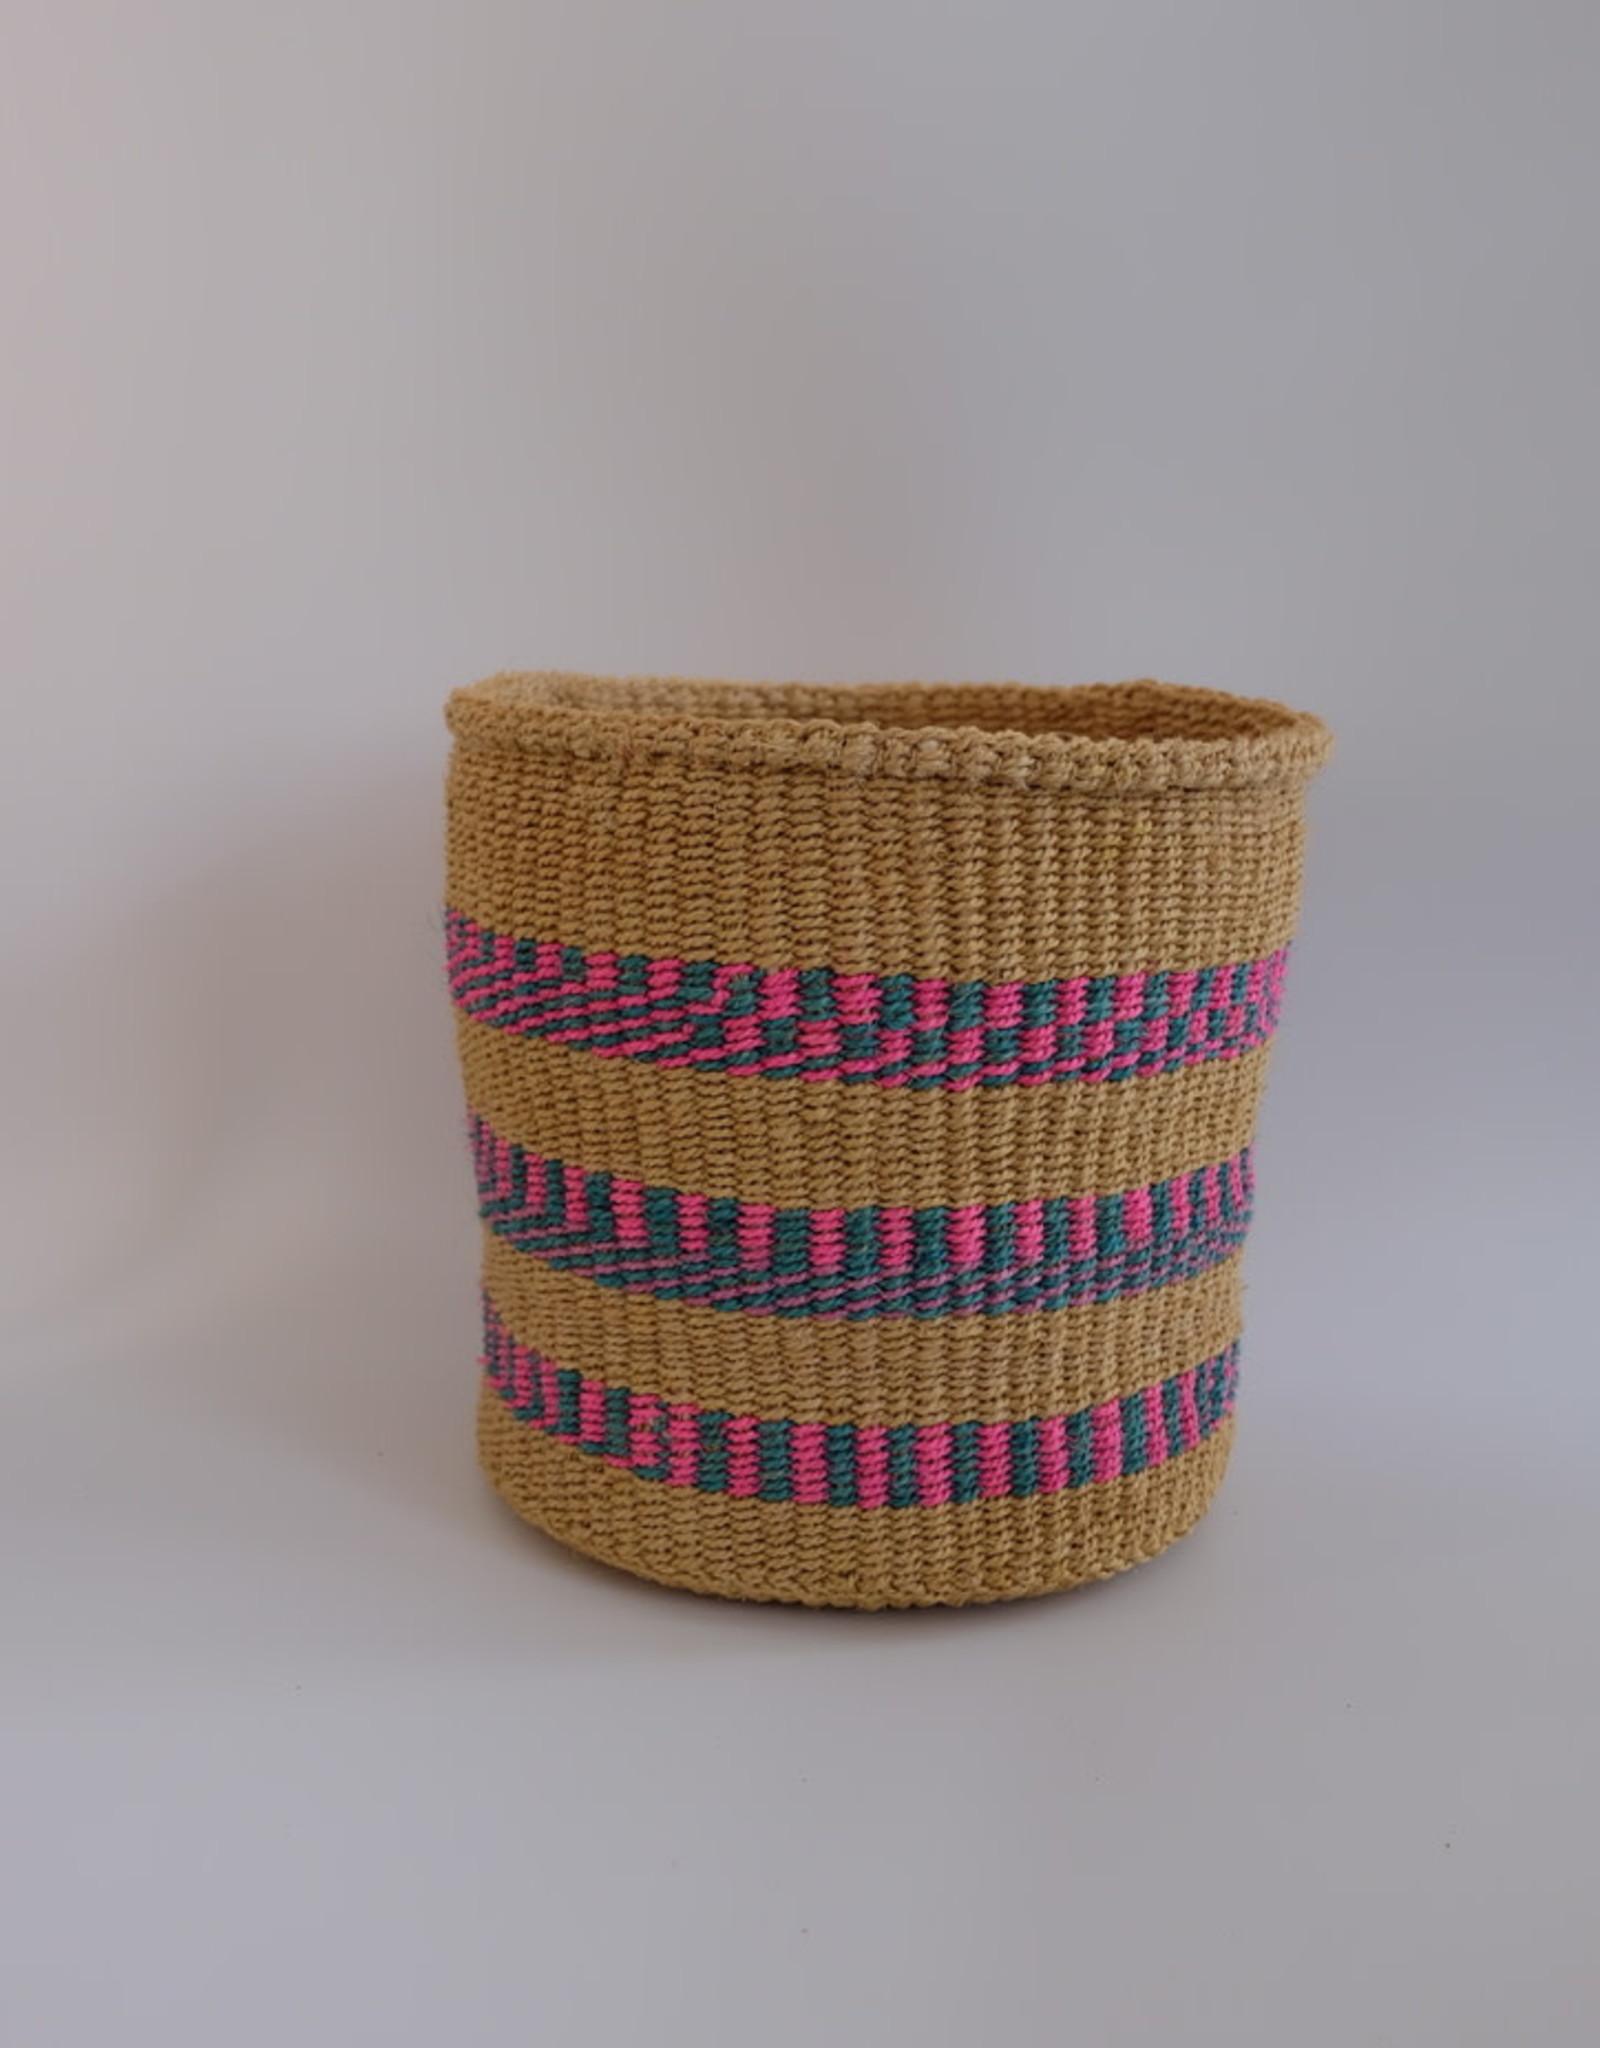 Solid Crafts Hadithi Basket M - pink & blue by Rose